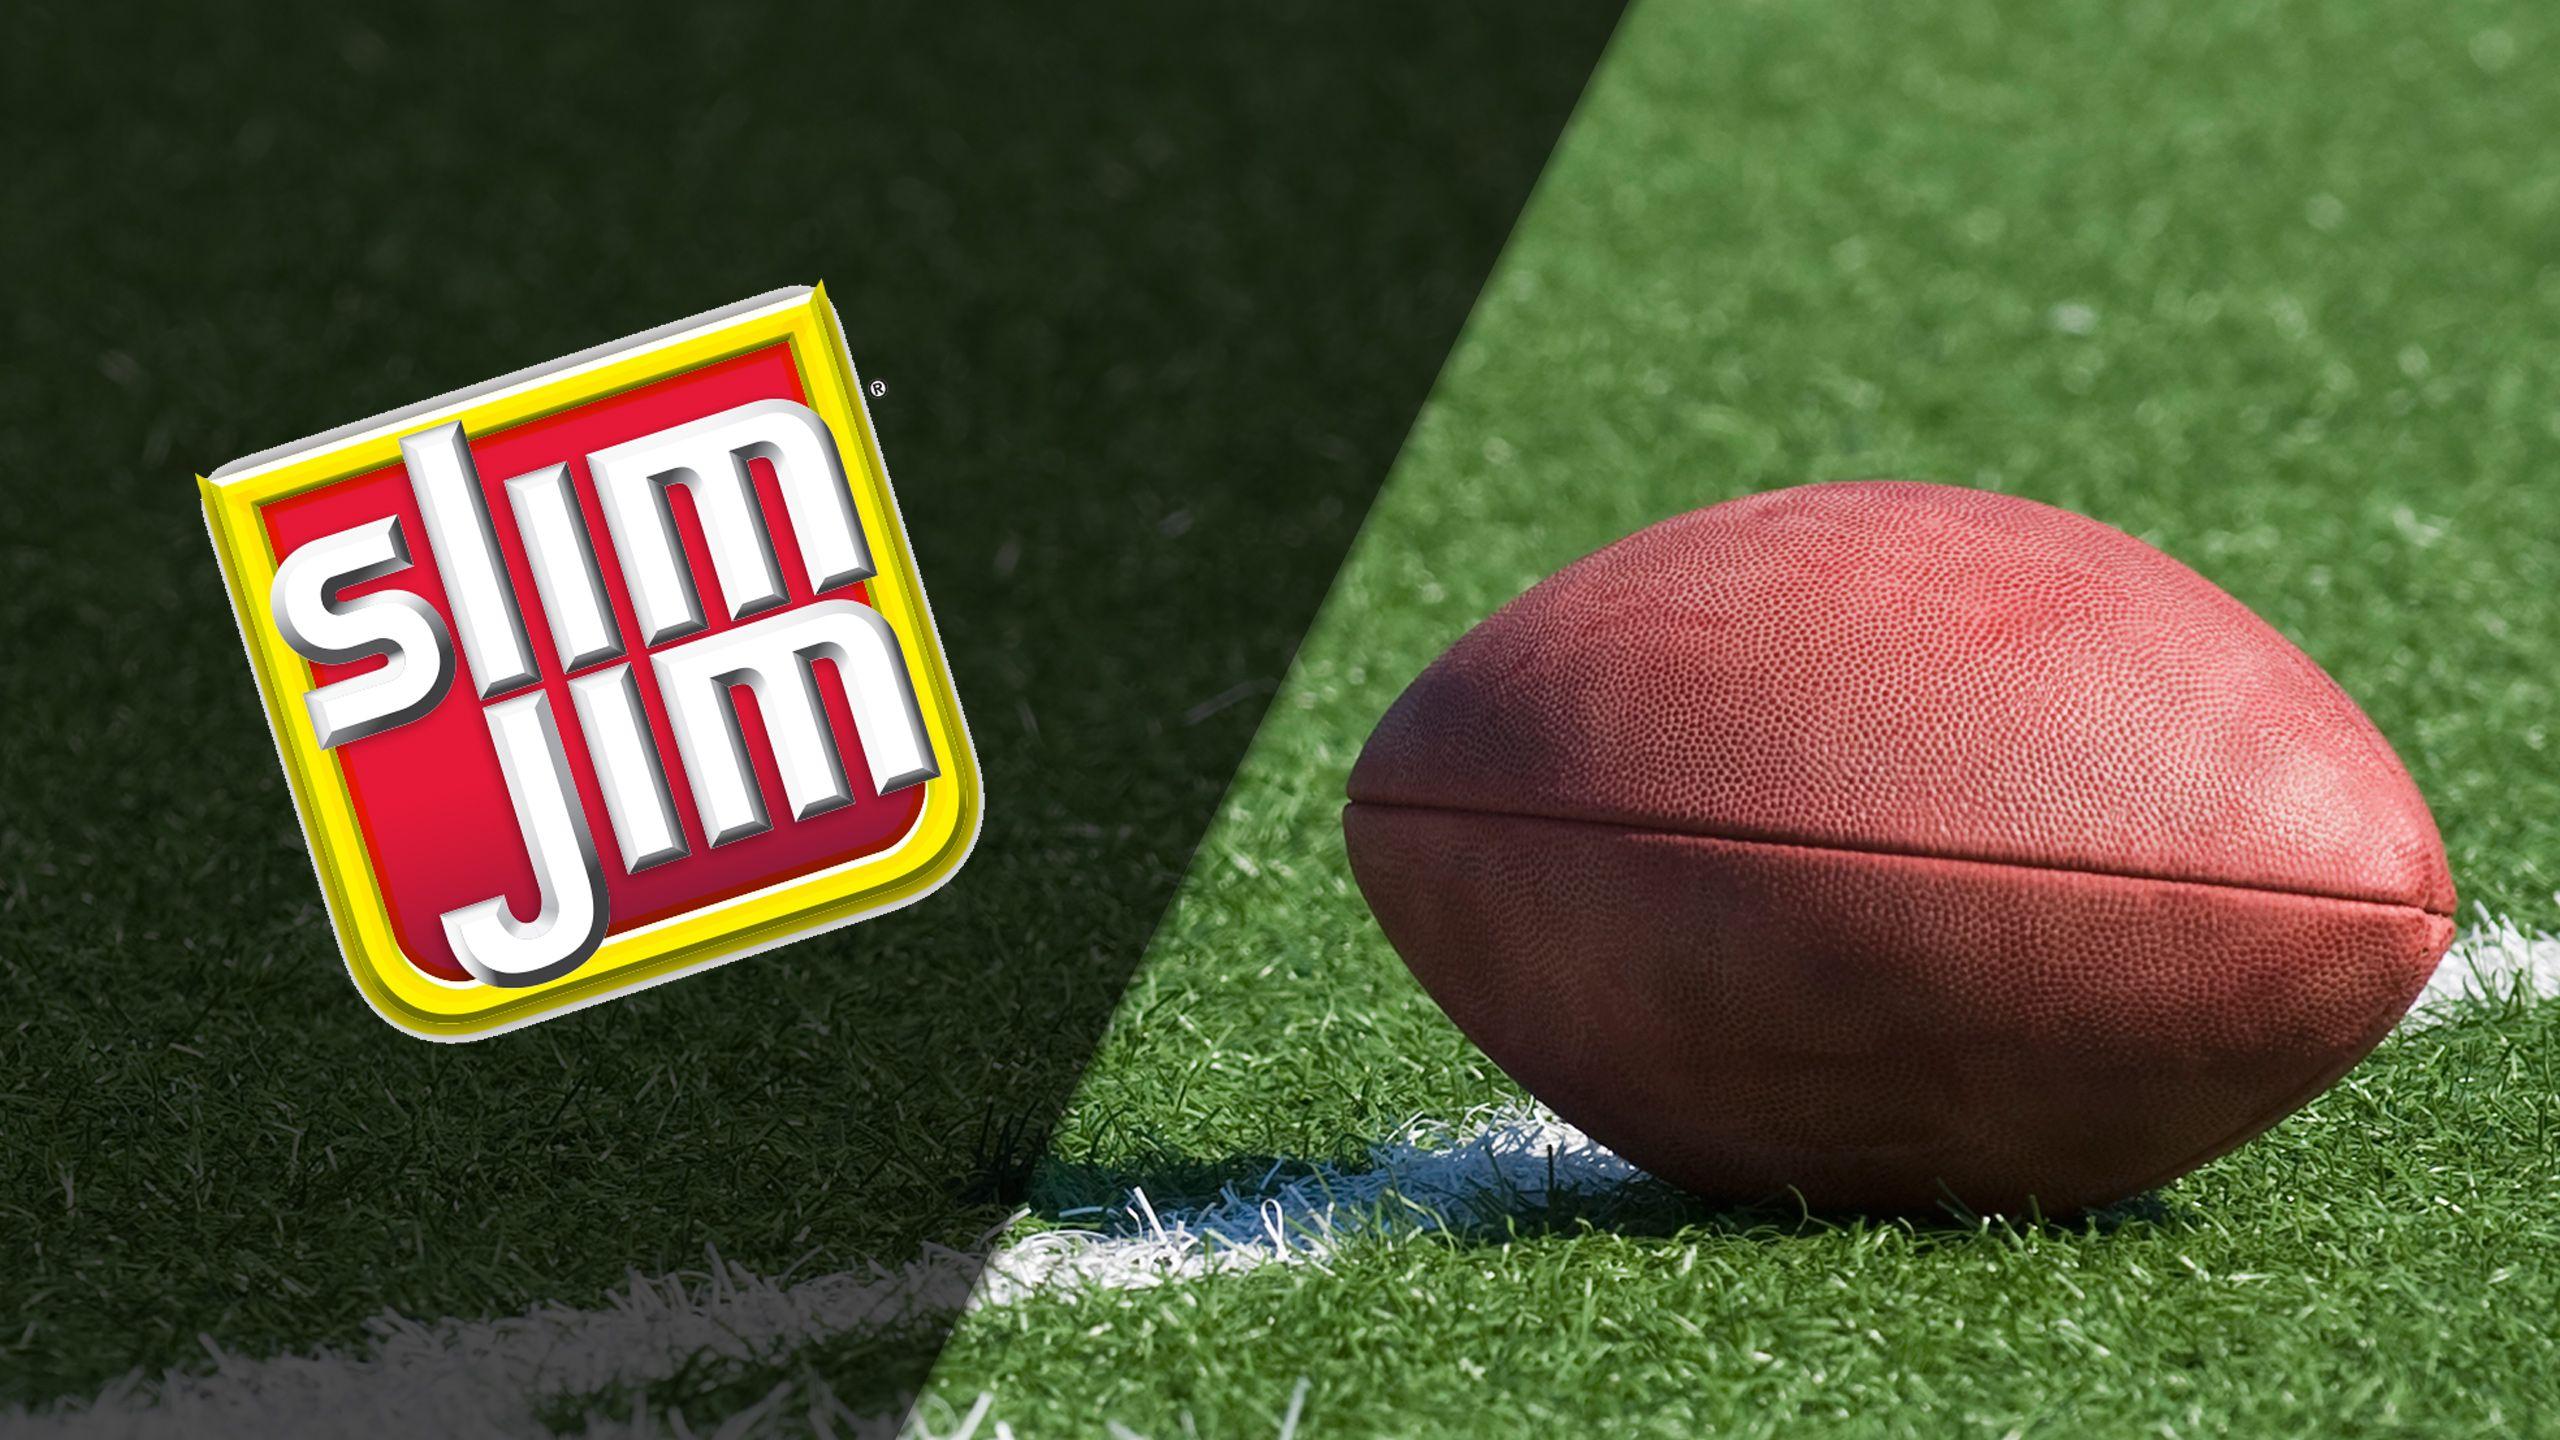 Slim Jim SkyCam - Slim Jim SkyCam - #17 Mississippi State vs. #11 Georgia (Football) (Football)